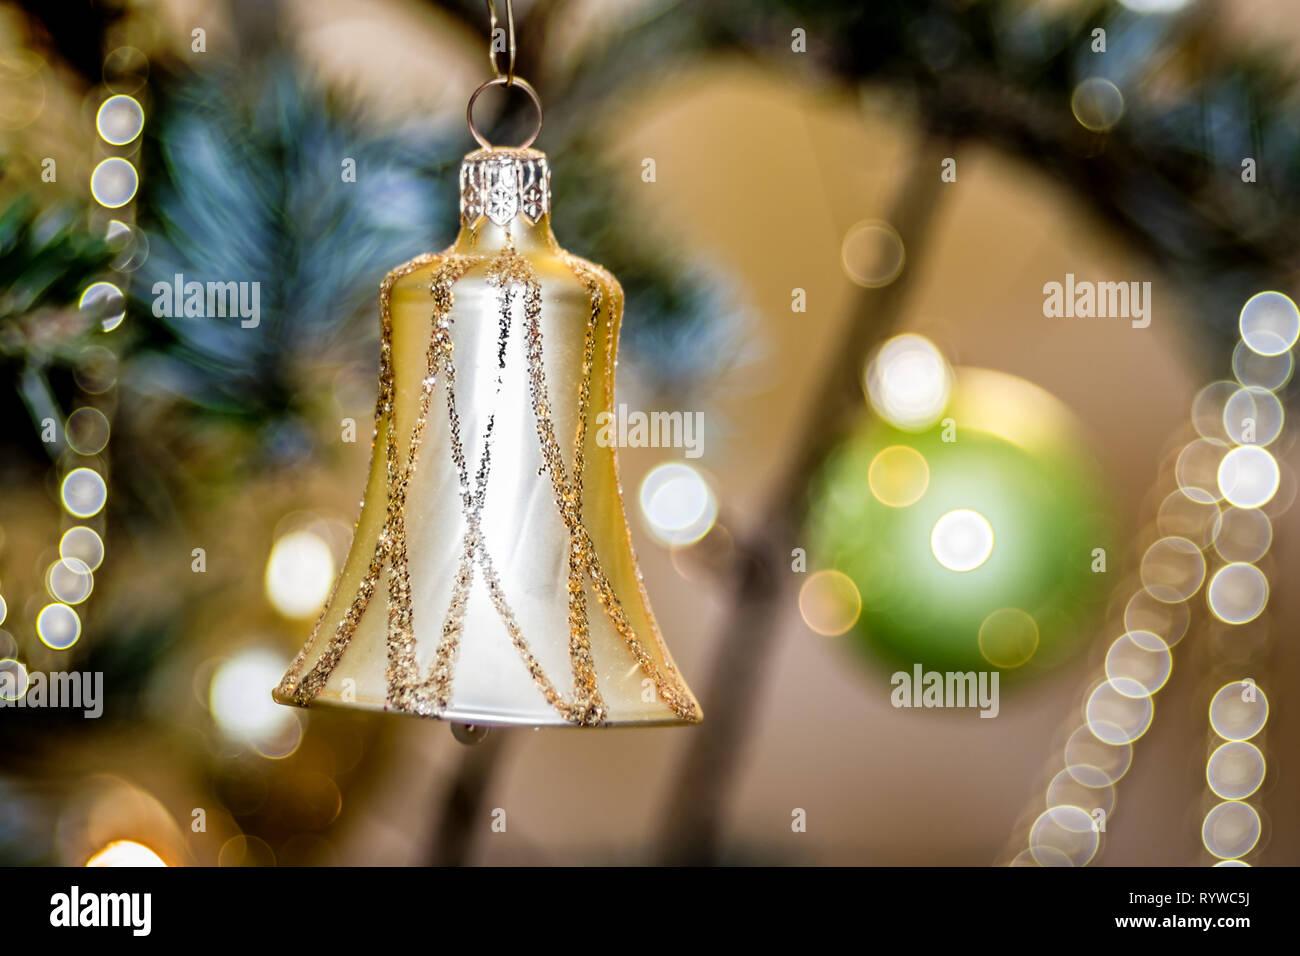 Christbaum Weihnachtsdekoration - Glocke Stock Photo